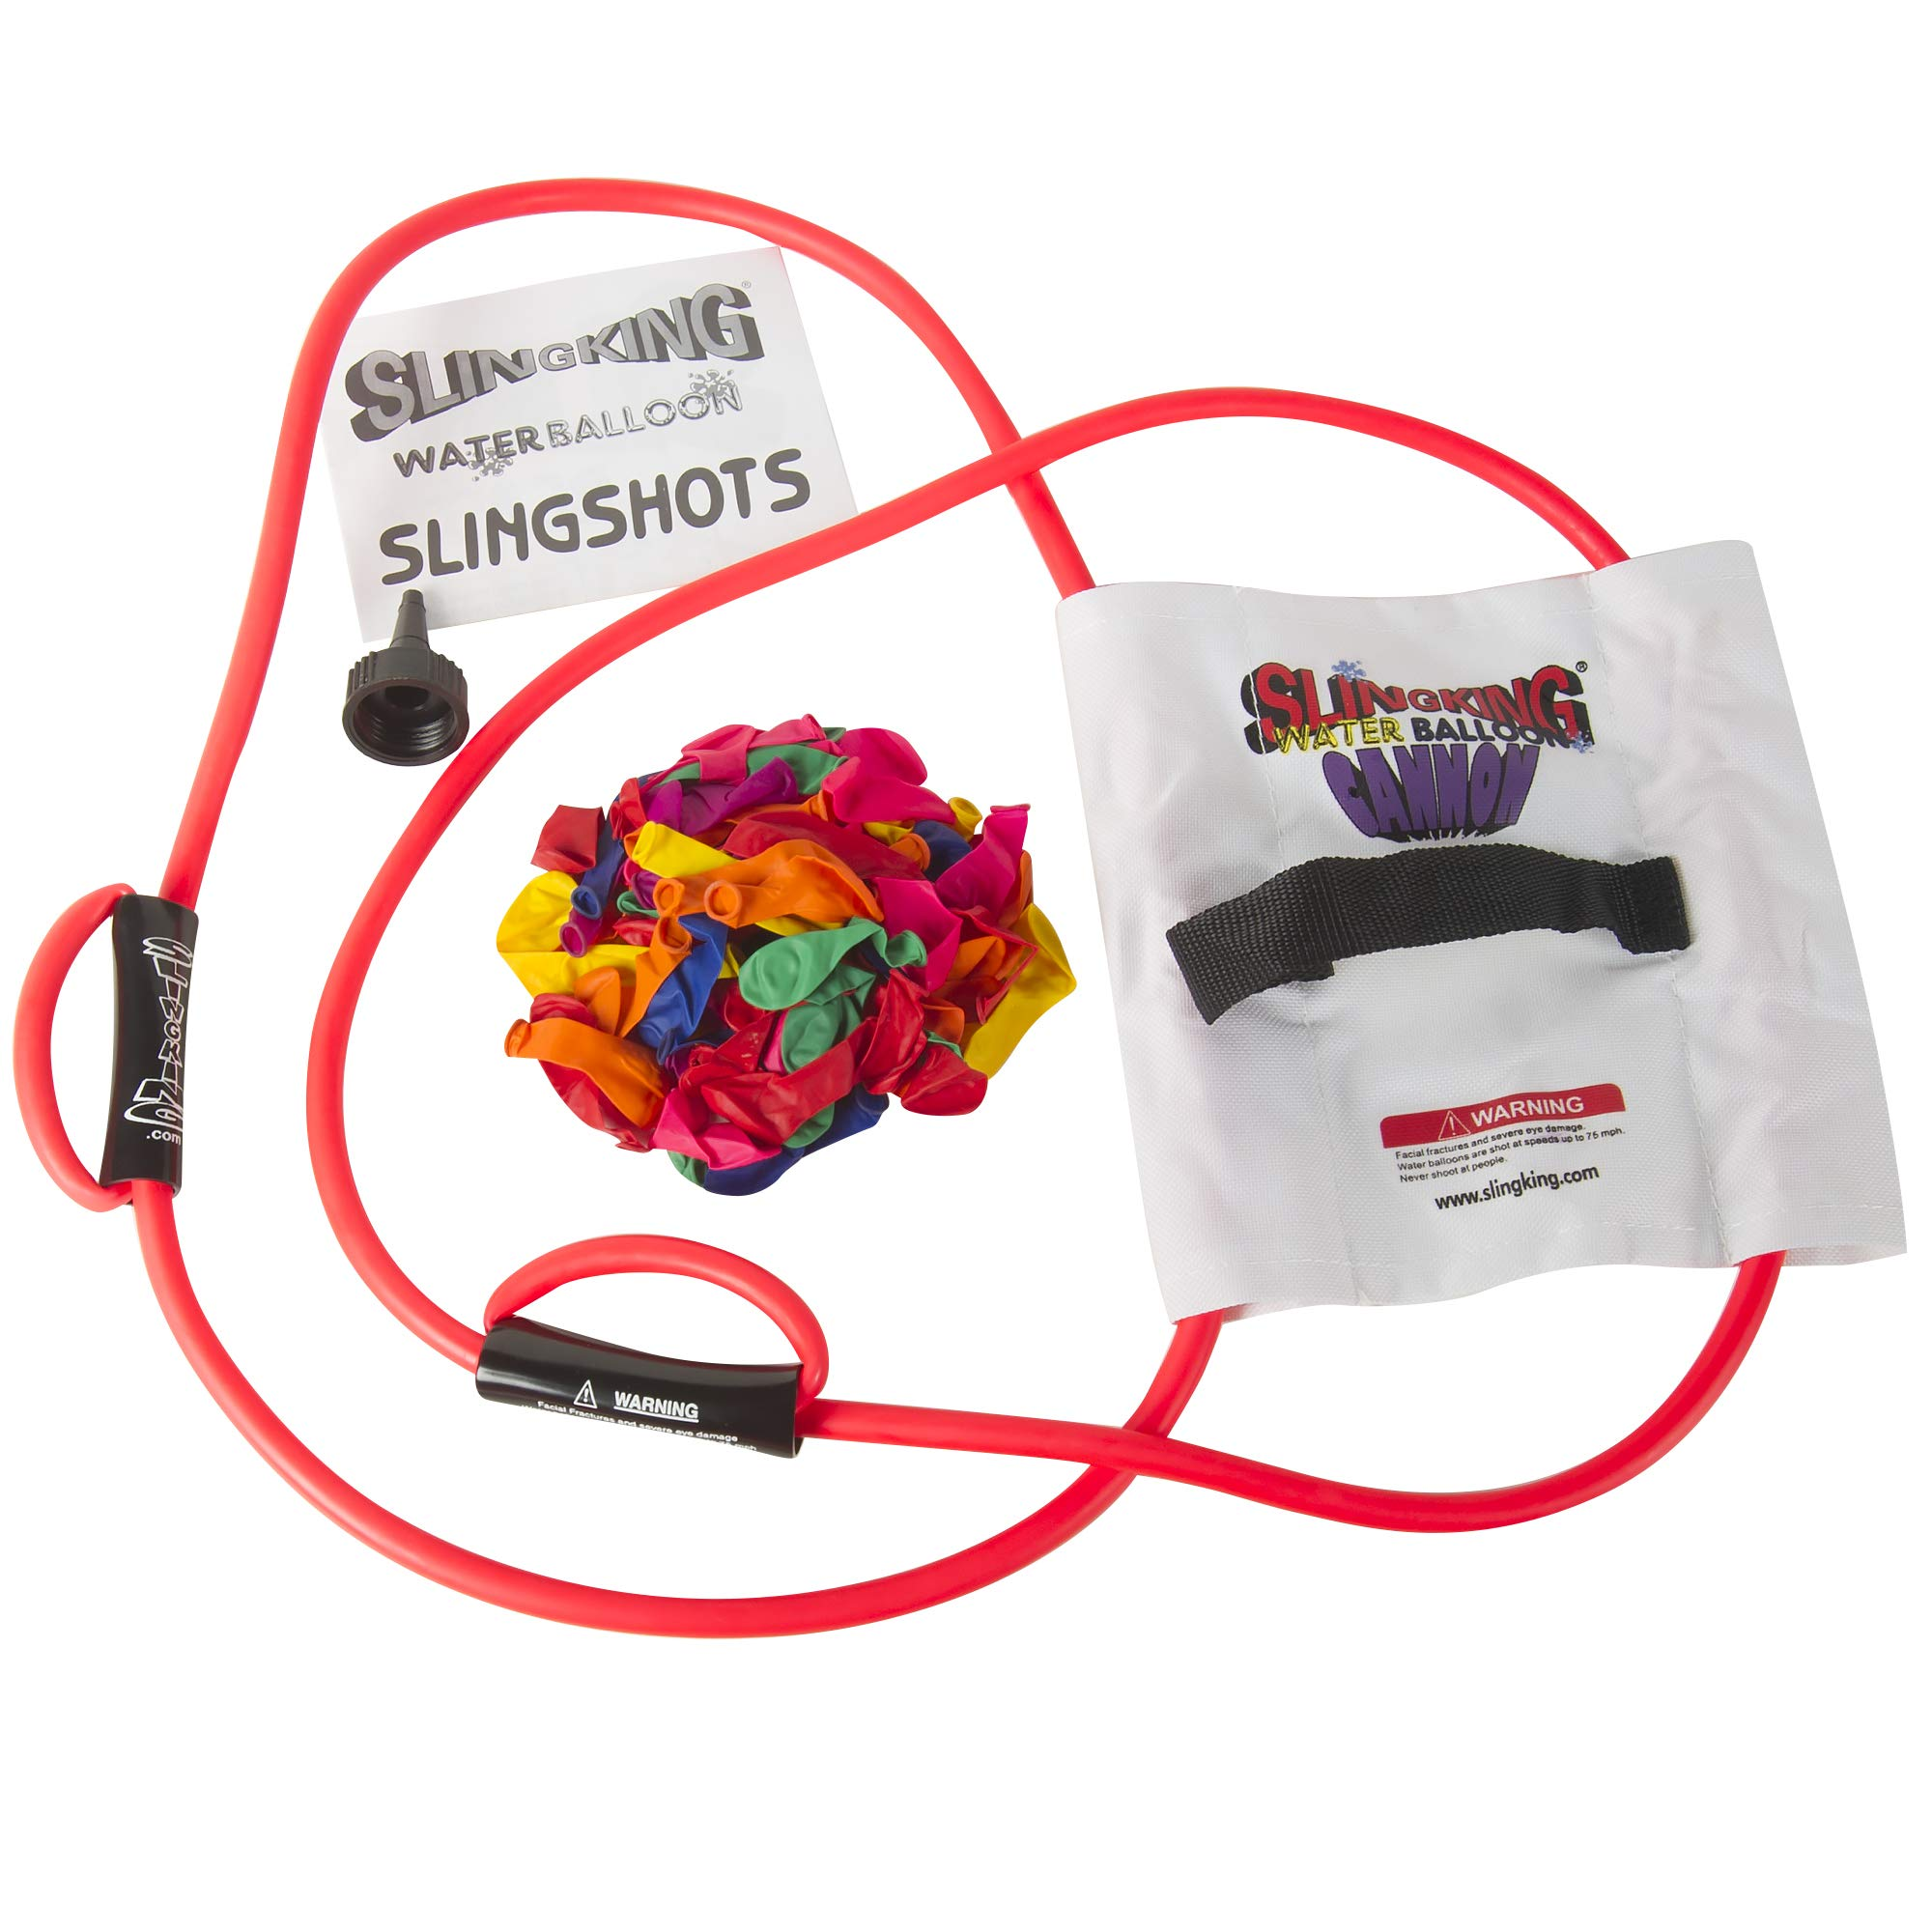 200-Yard Water Balloon Cannon Kit (colors may vary)